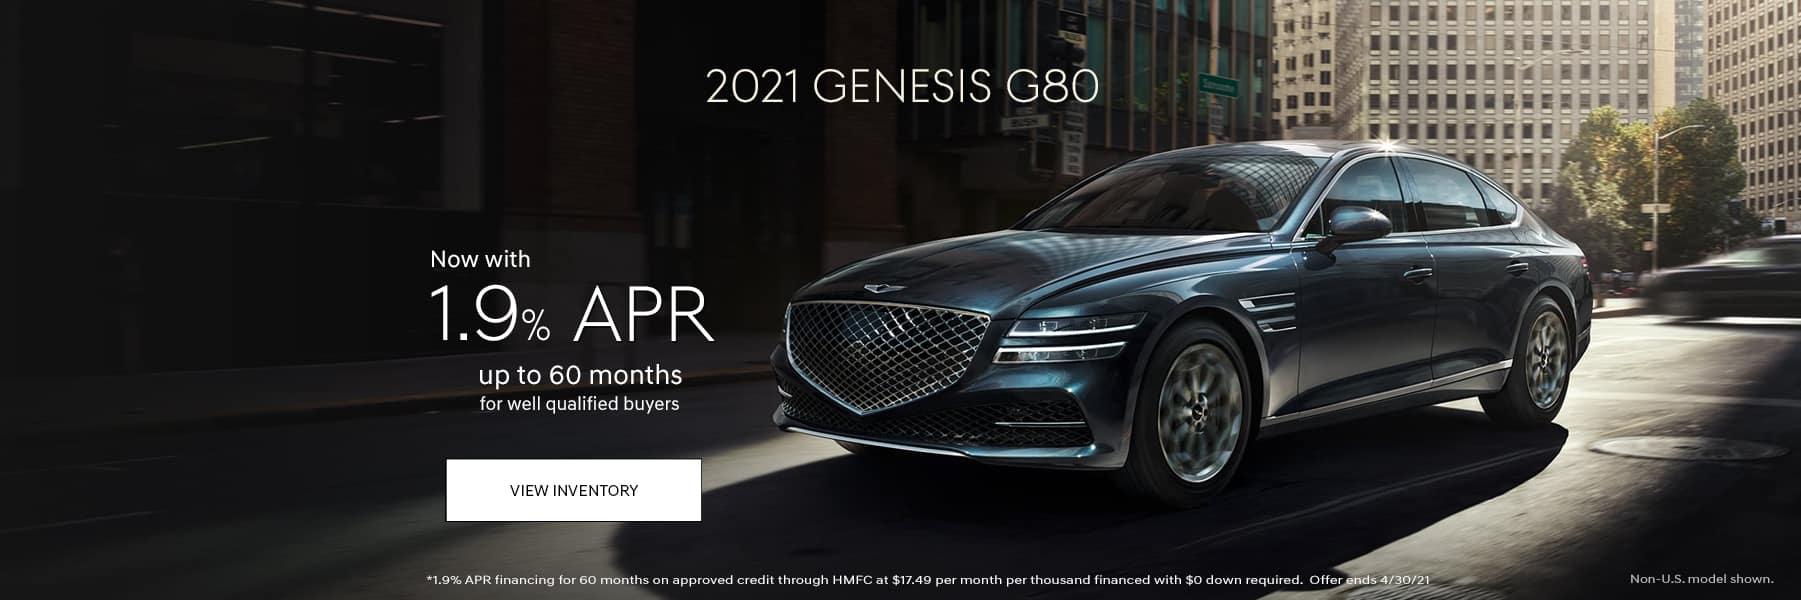 2021-Genesis-G80-Apr21